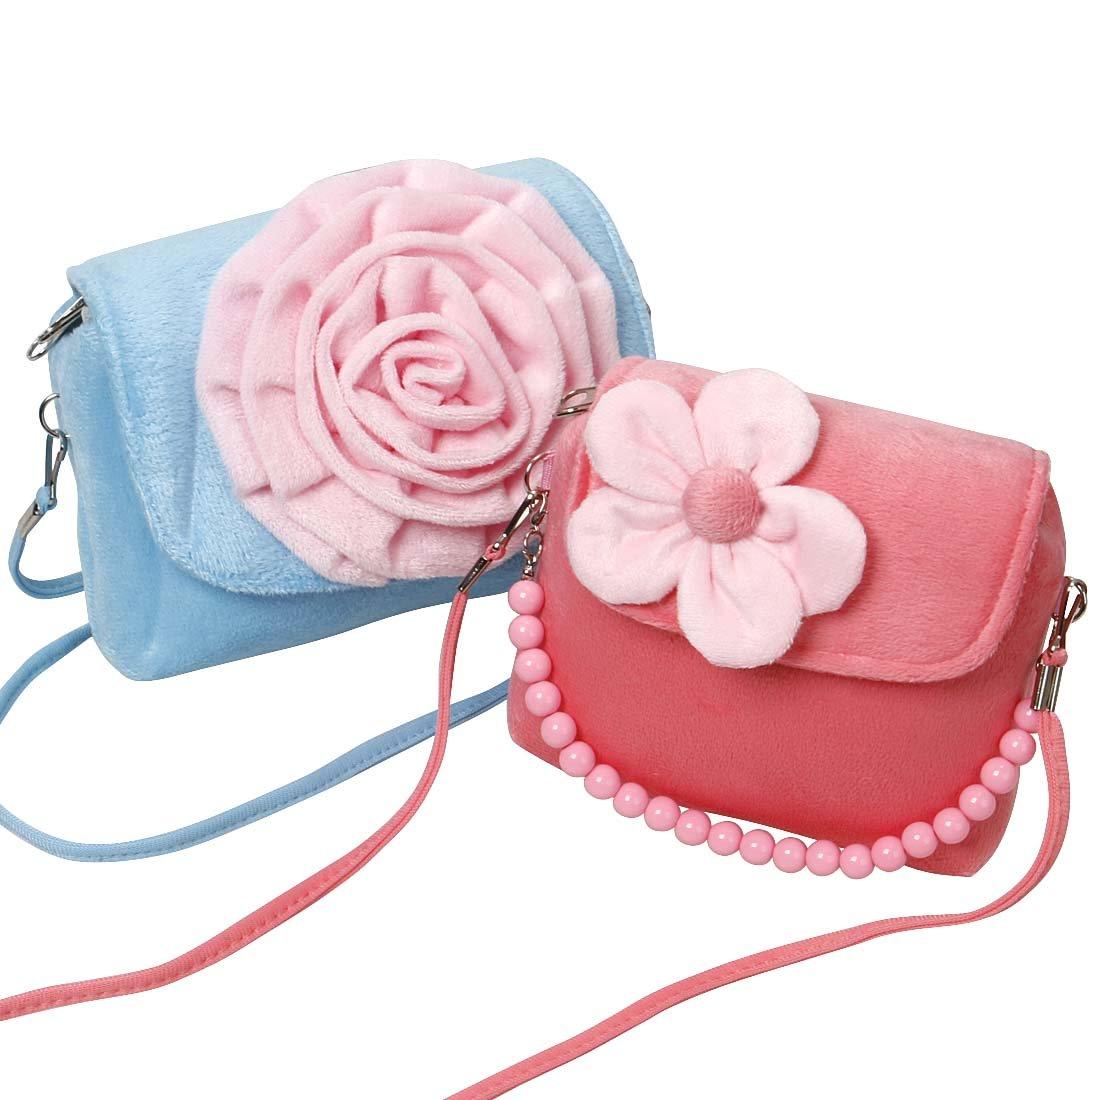 Bundle Monster Cute 2pc Little Girls Fashionable Fun Fuzzy Floral Handbag Set